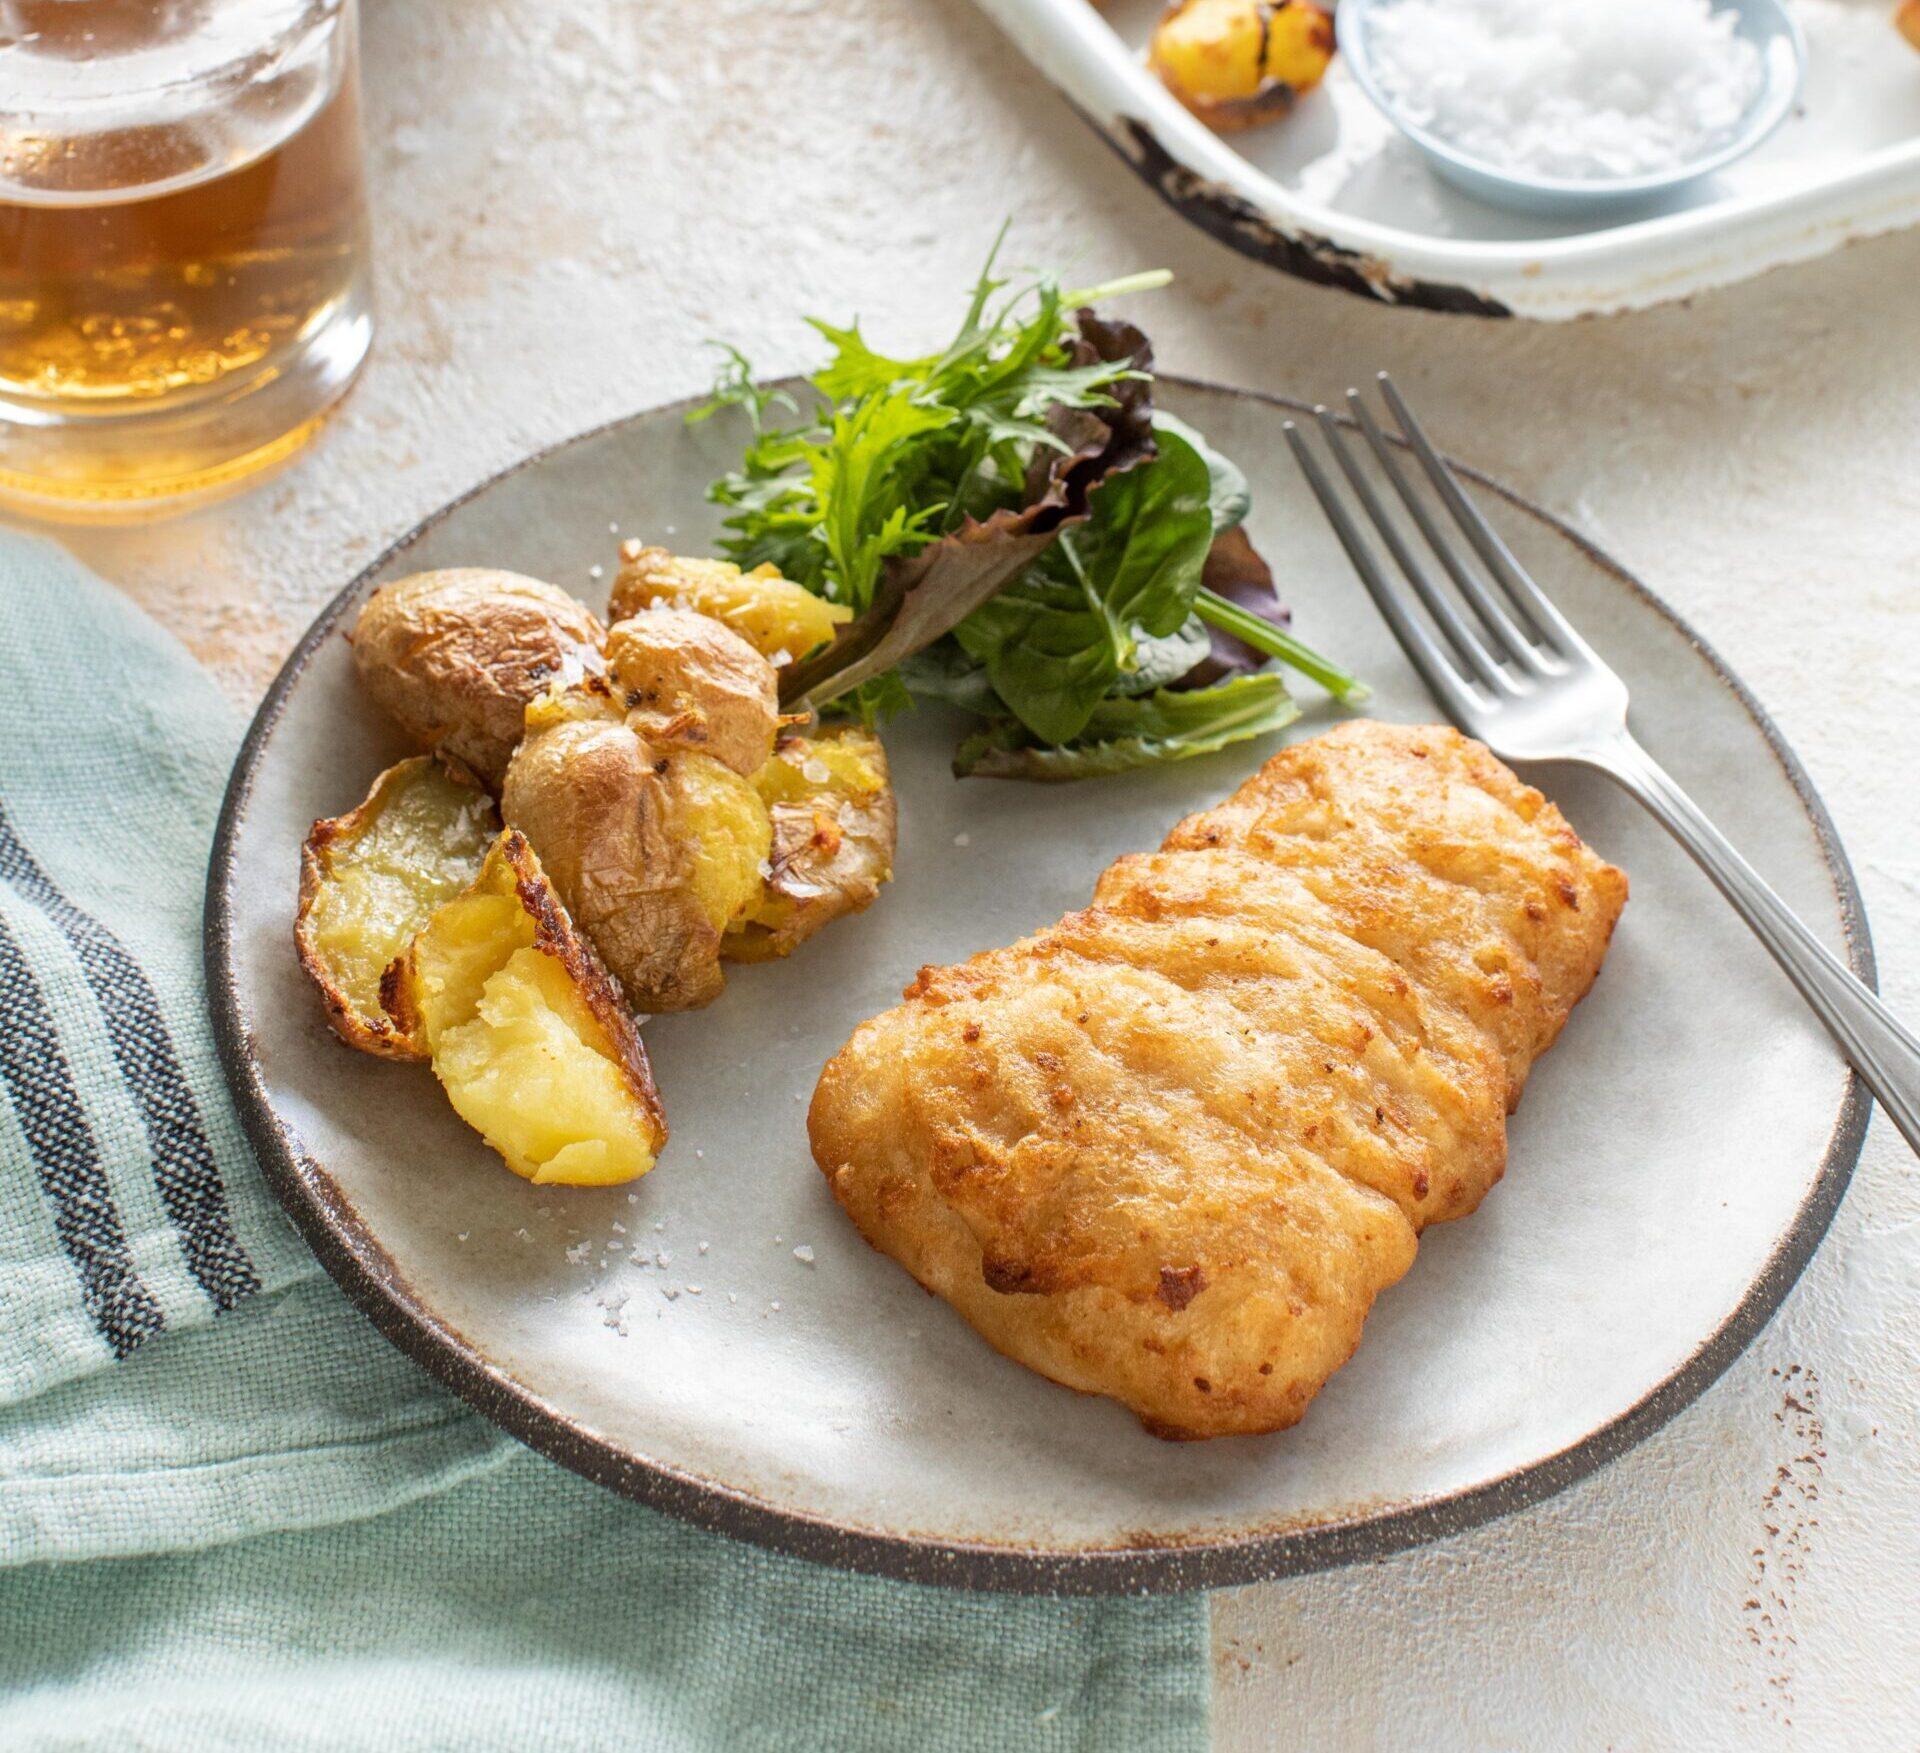 Donegal Catch Irish Pale Ale Battered Atlantic Haddock with salt and vinegar crispy potatoes